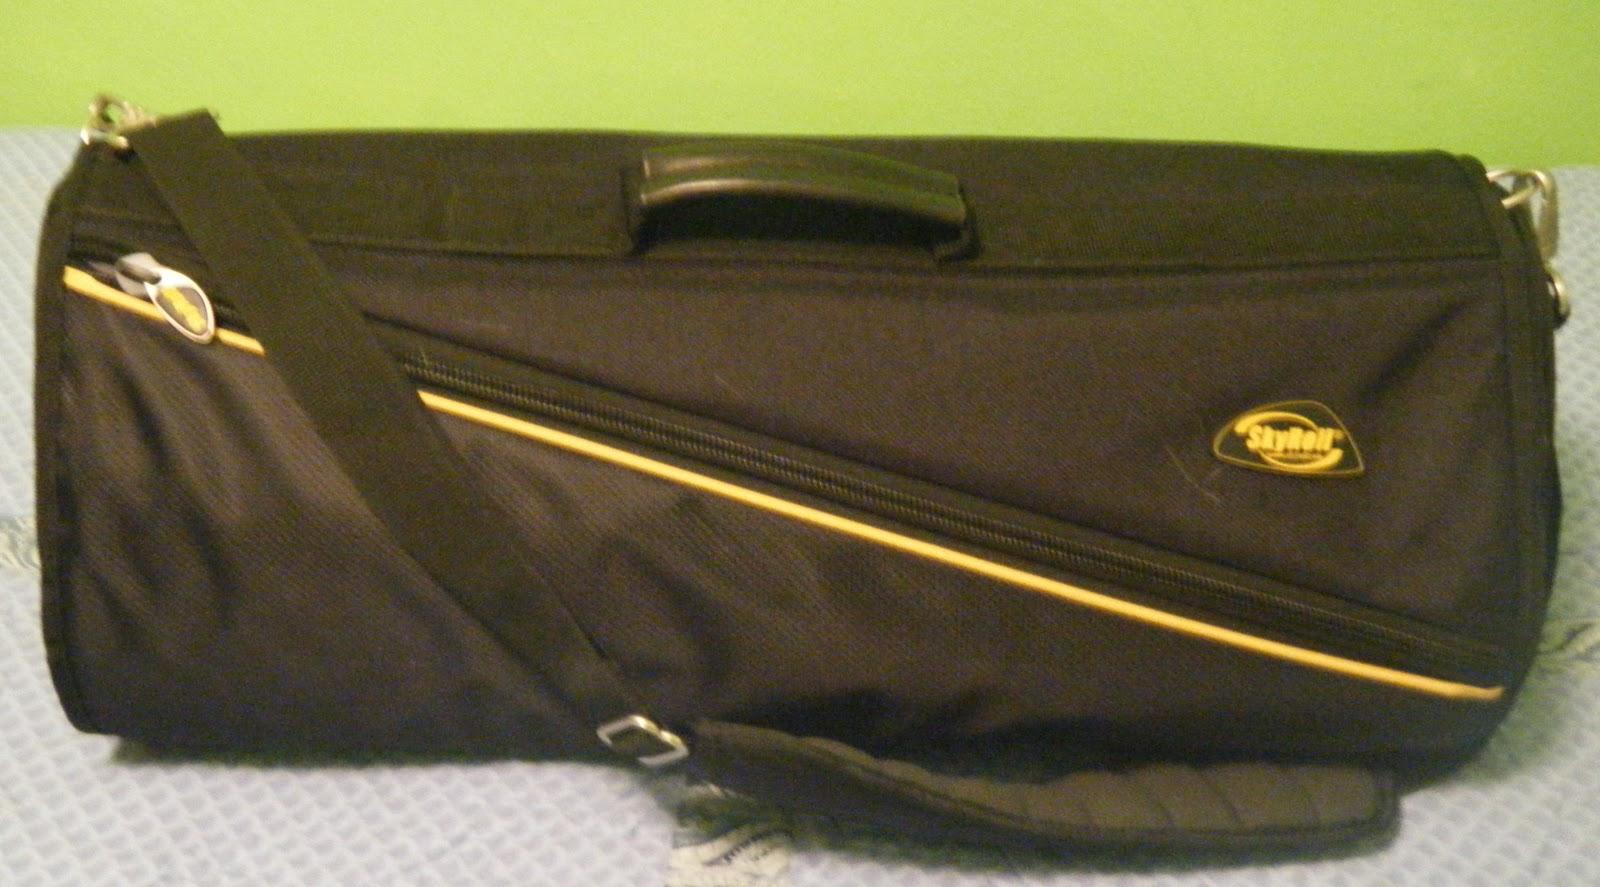 Review Skyroll Garment Bag Shereen Travels